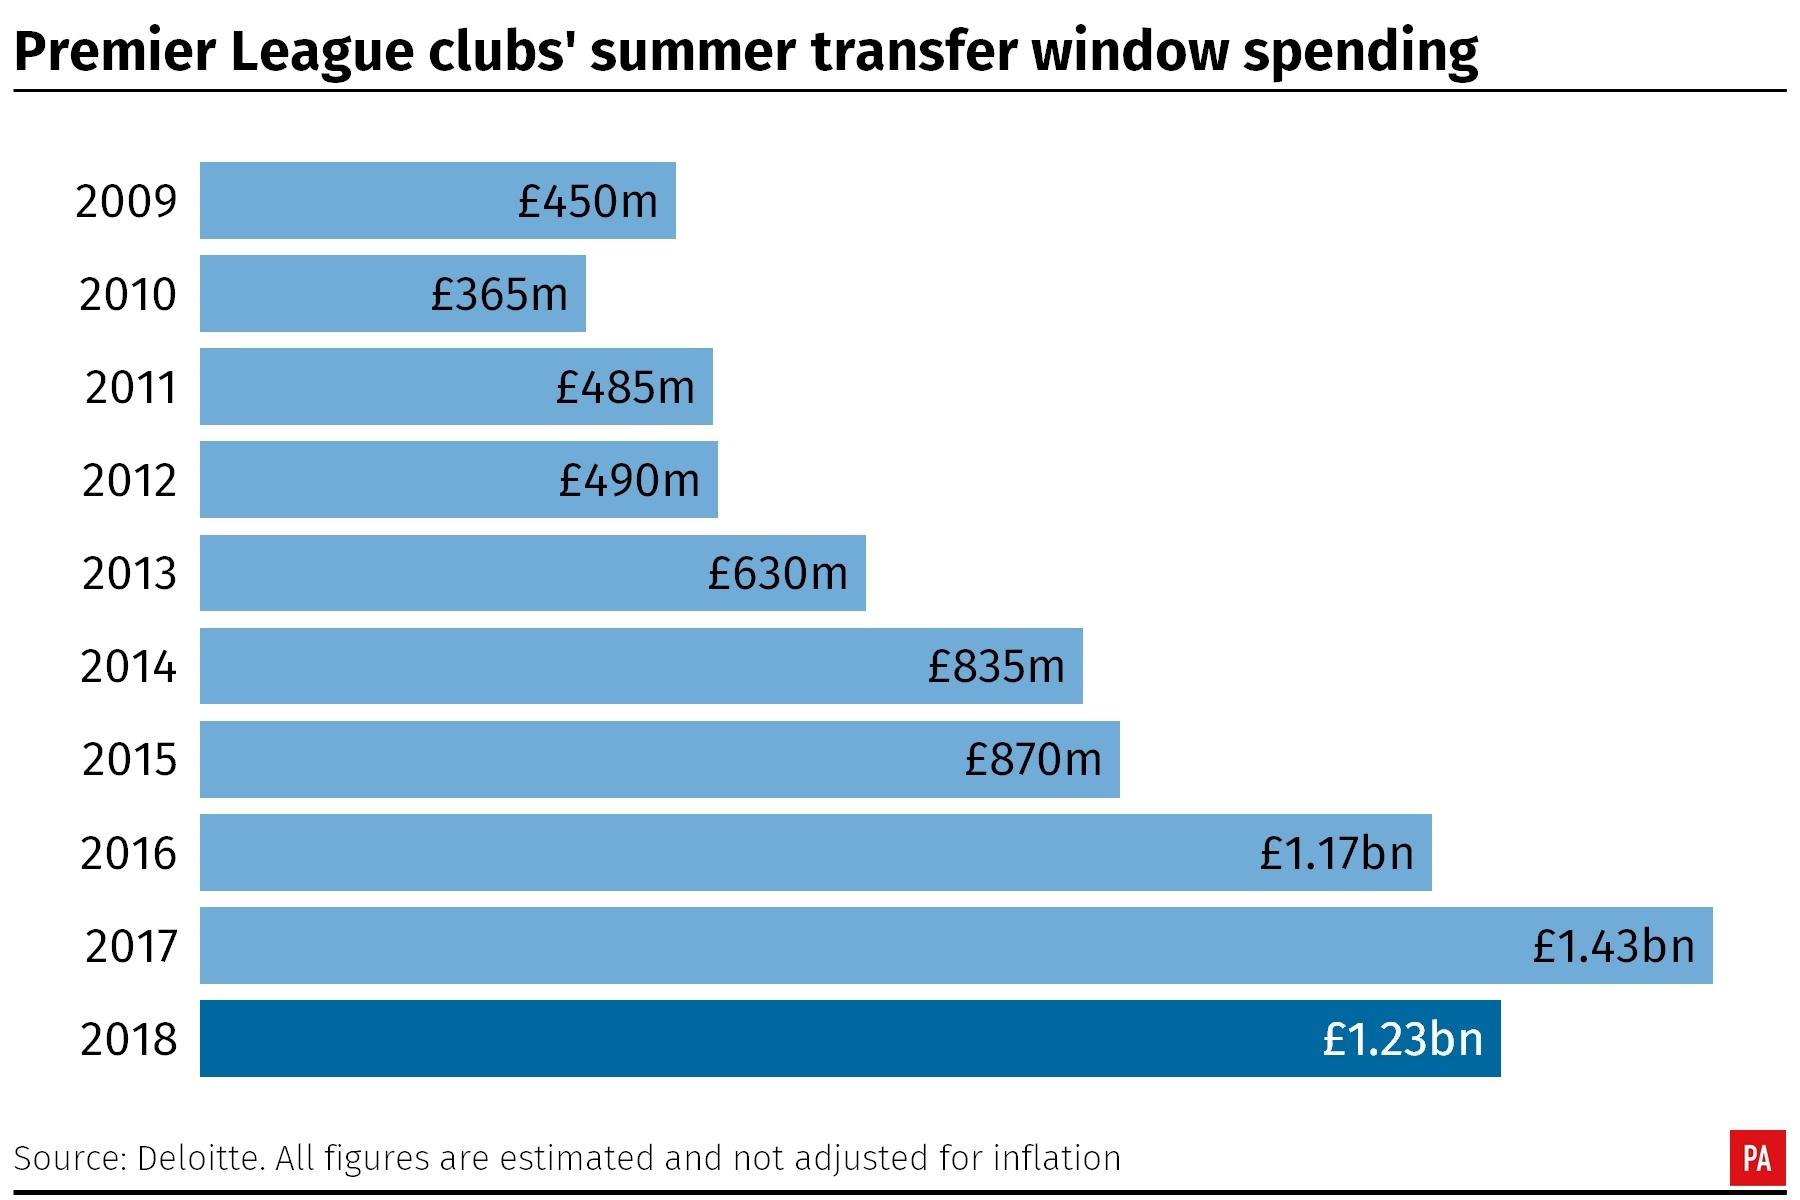 Premier League clubs' summer transfer window spending